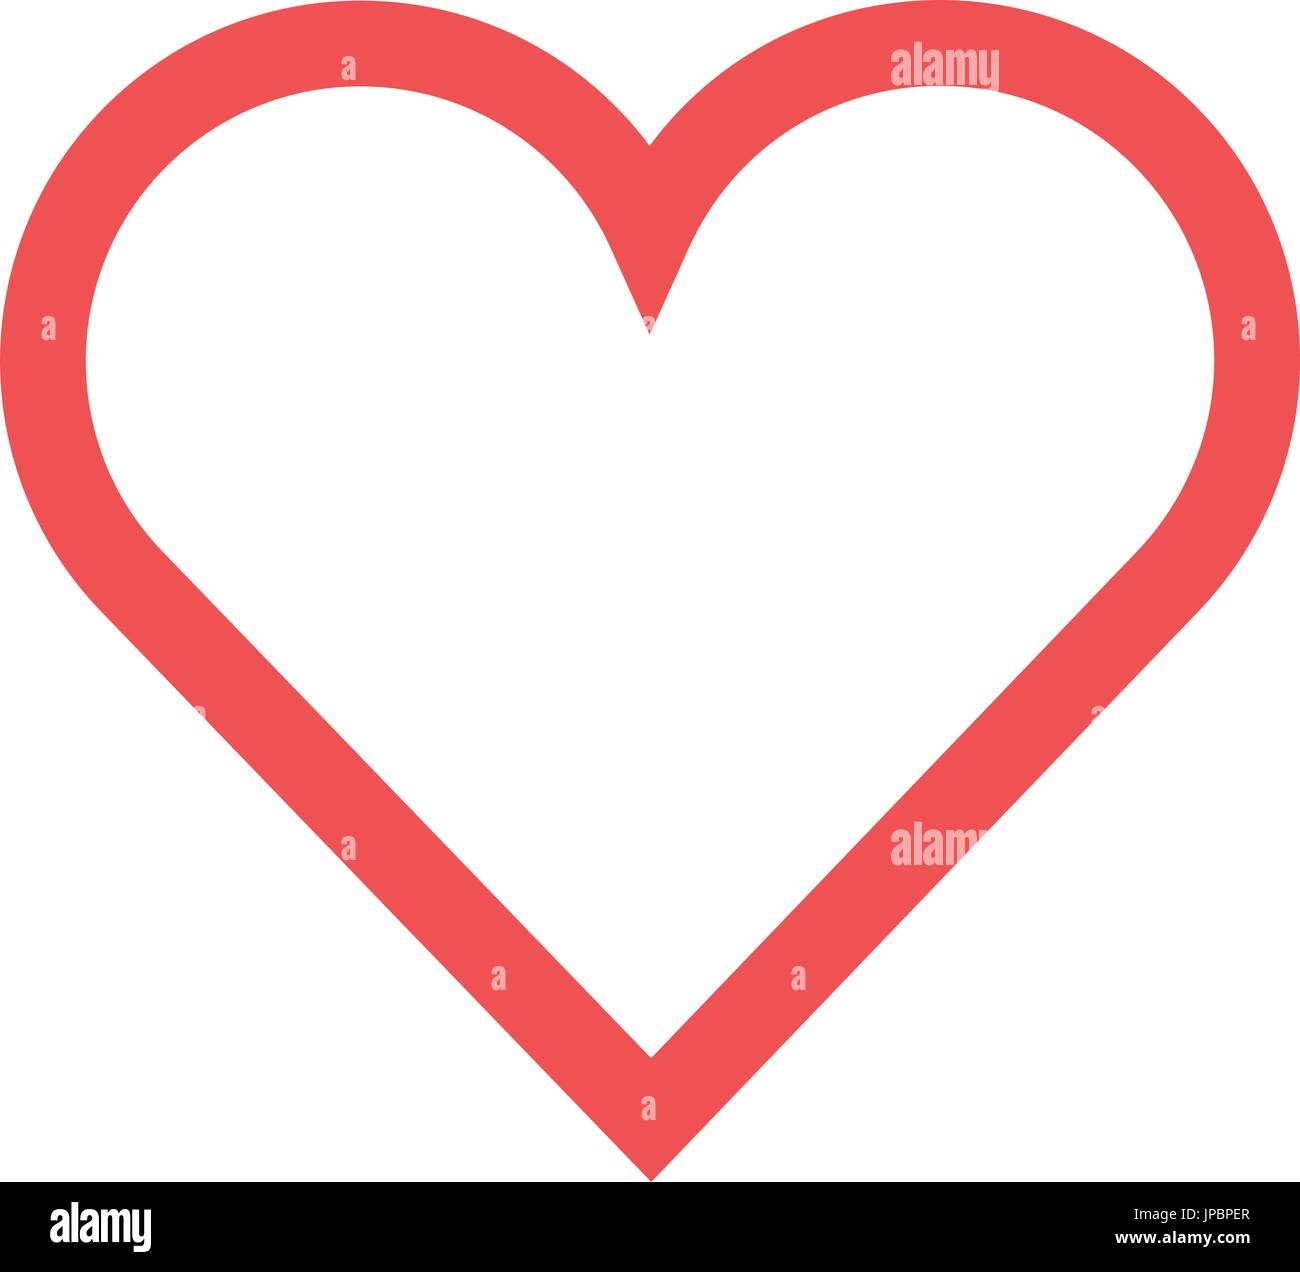 Human heart symbol - Stock Image